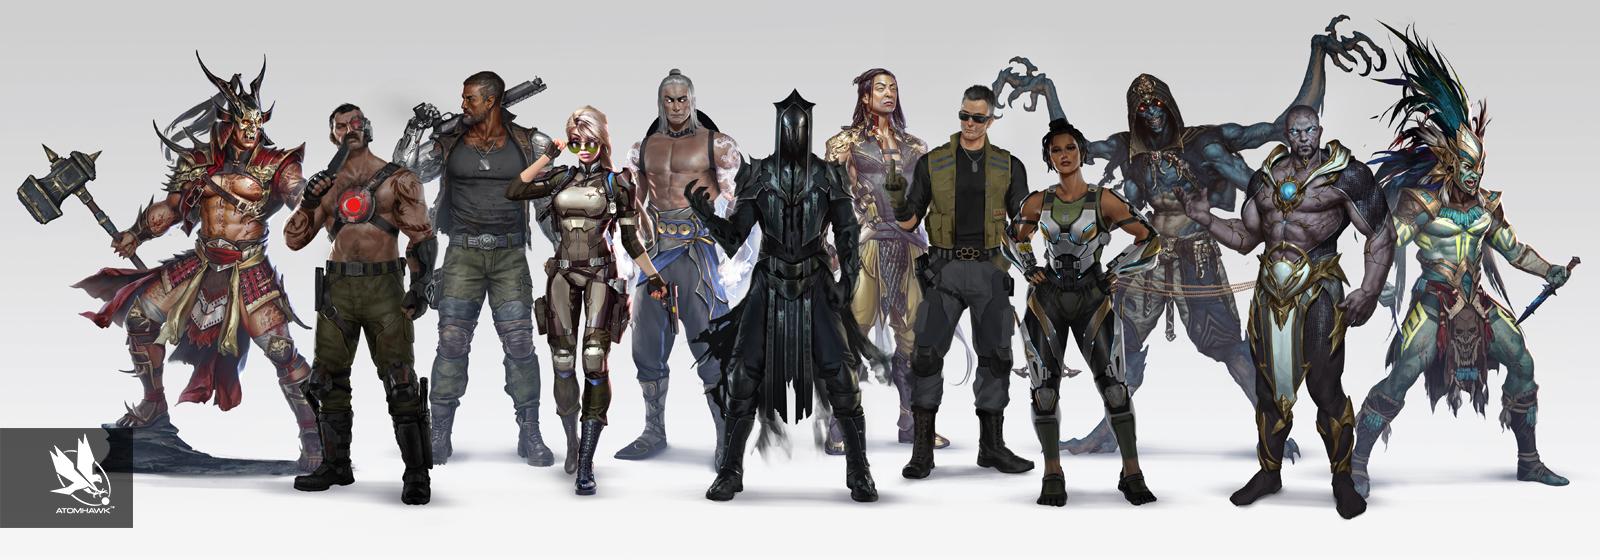 Atomhawk_Warner-Bros-NetherRealm_Mortal-Kombat-11_Concept-Art_Character-Design_Line-Up_Present.jpg